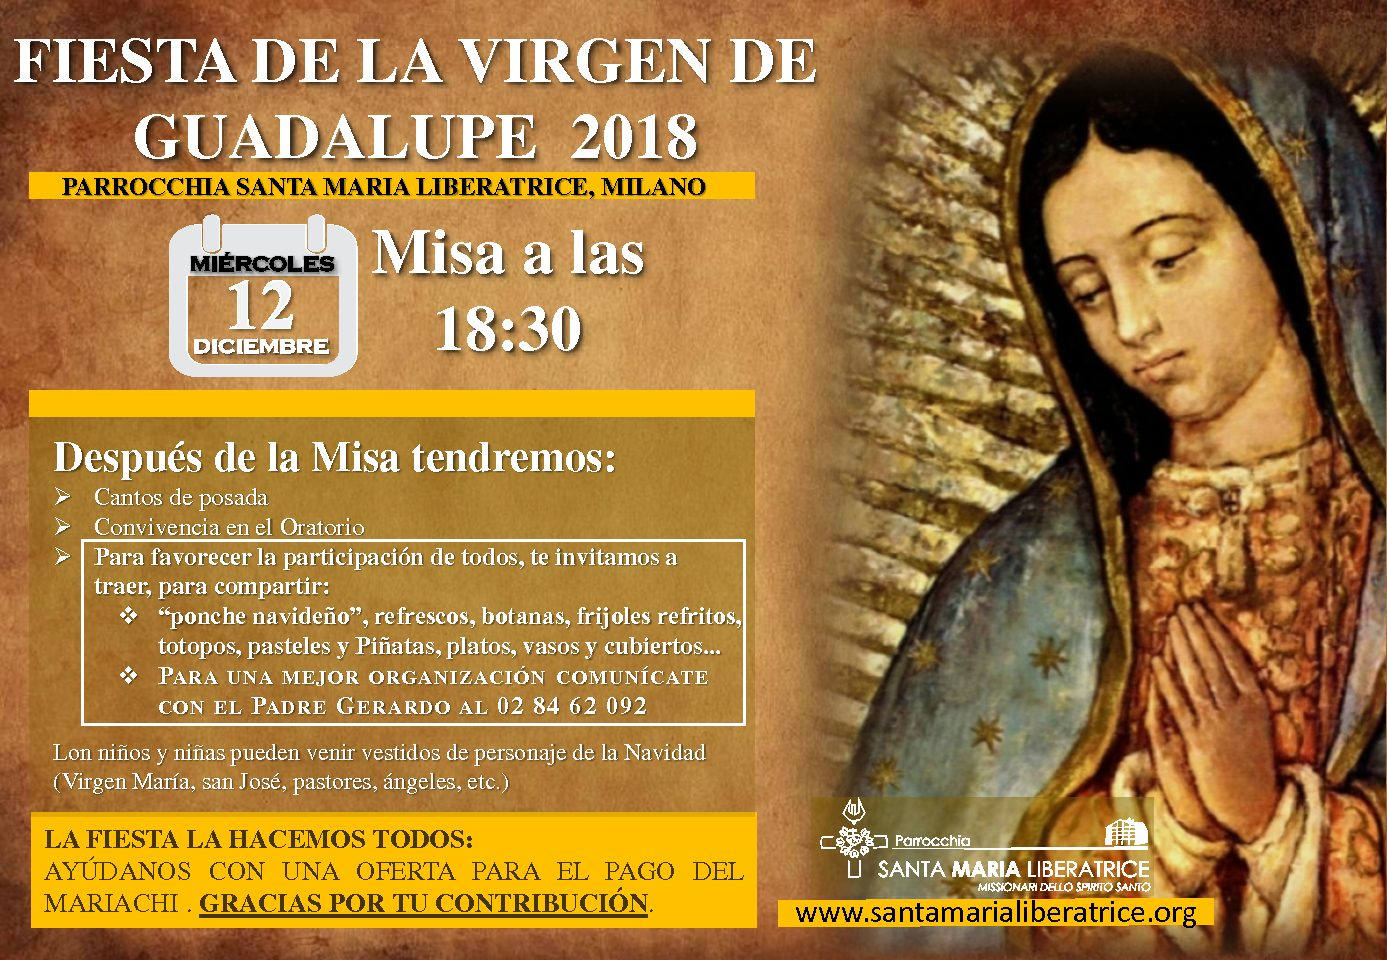 Fiesta de la Virgen de Guadalupe